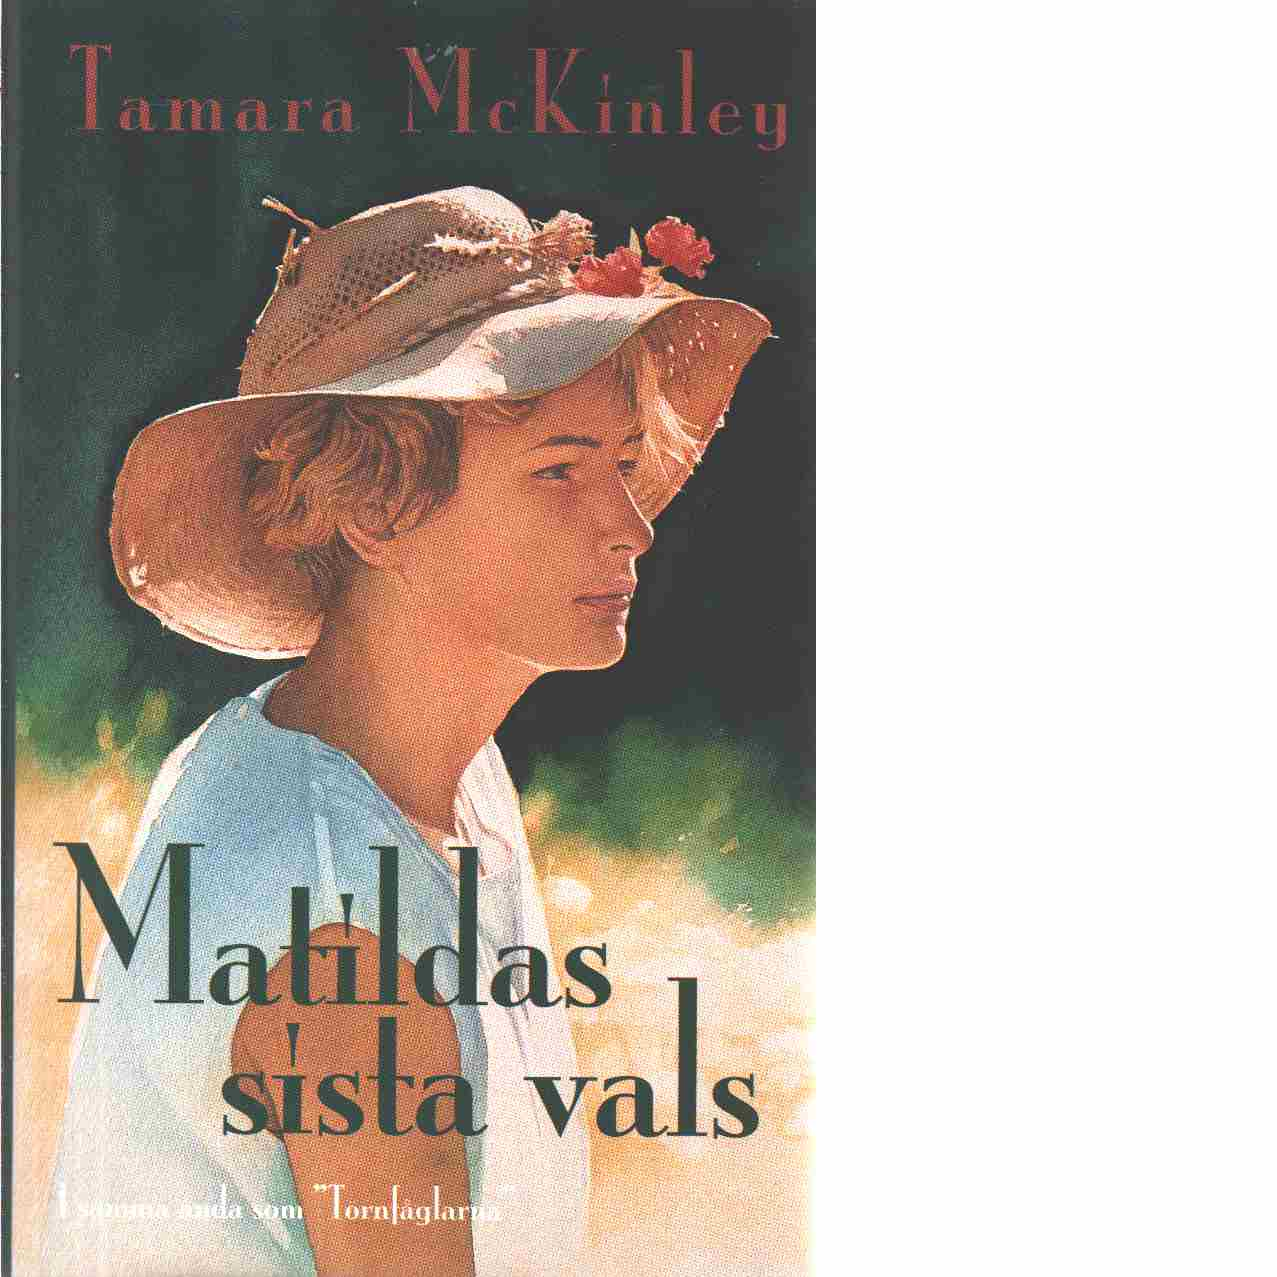 Matildas sista vals - Mckinley, Tamara